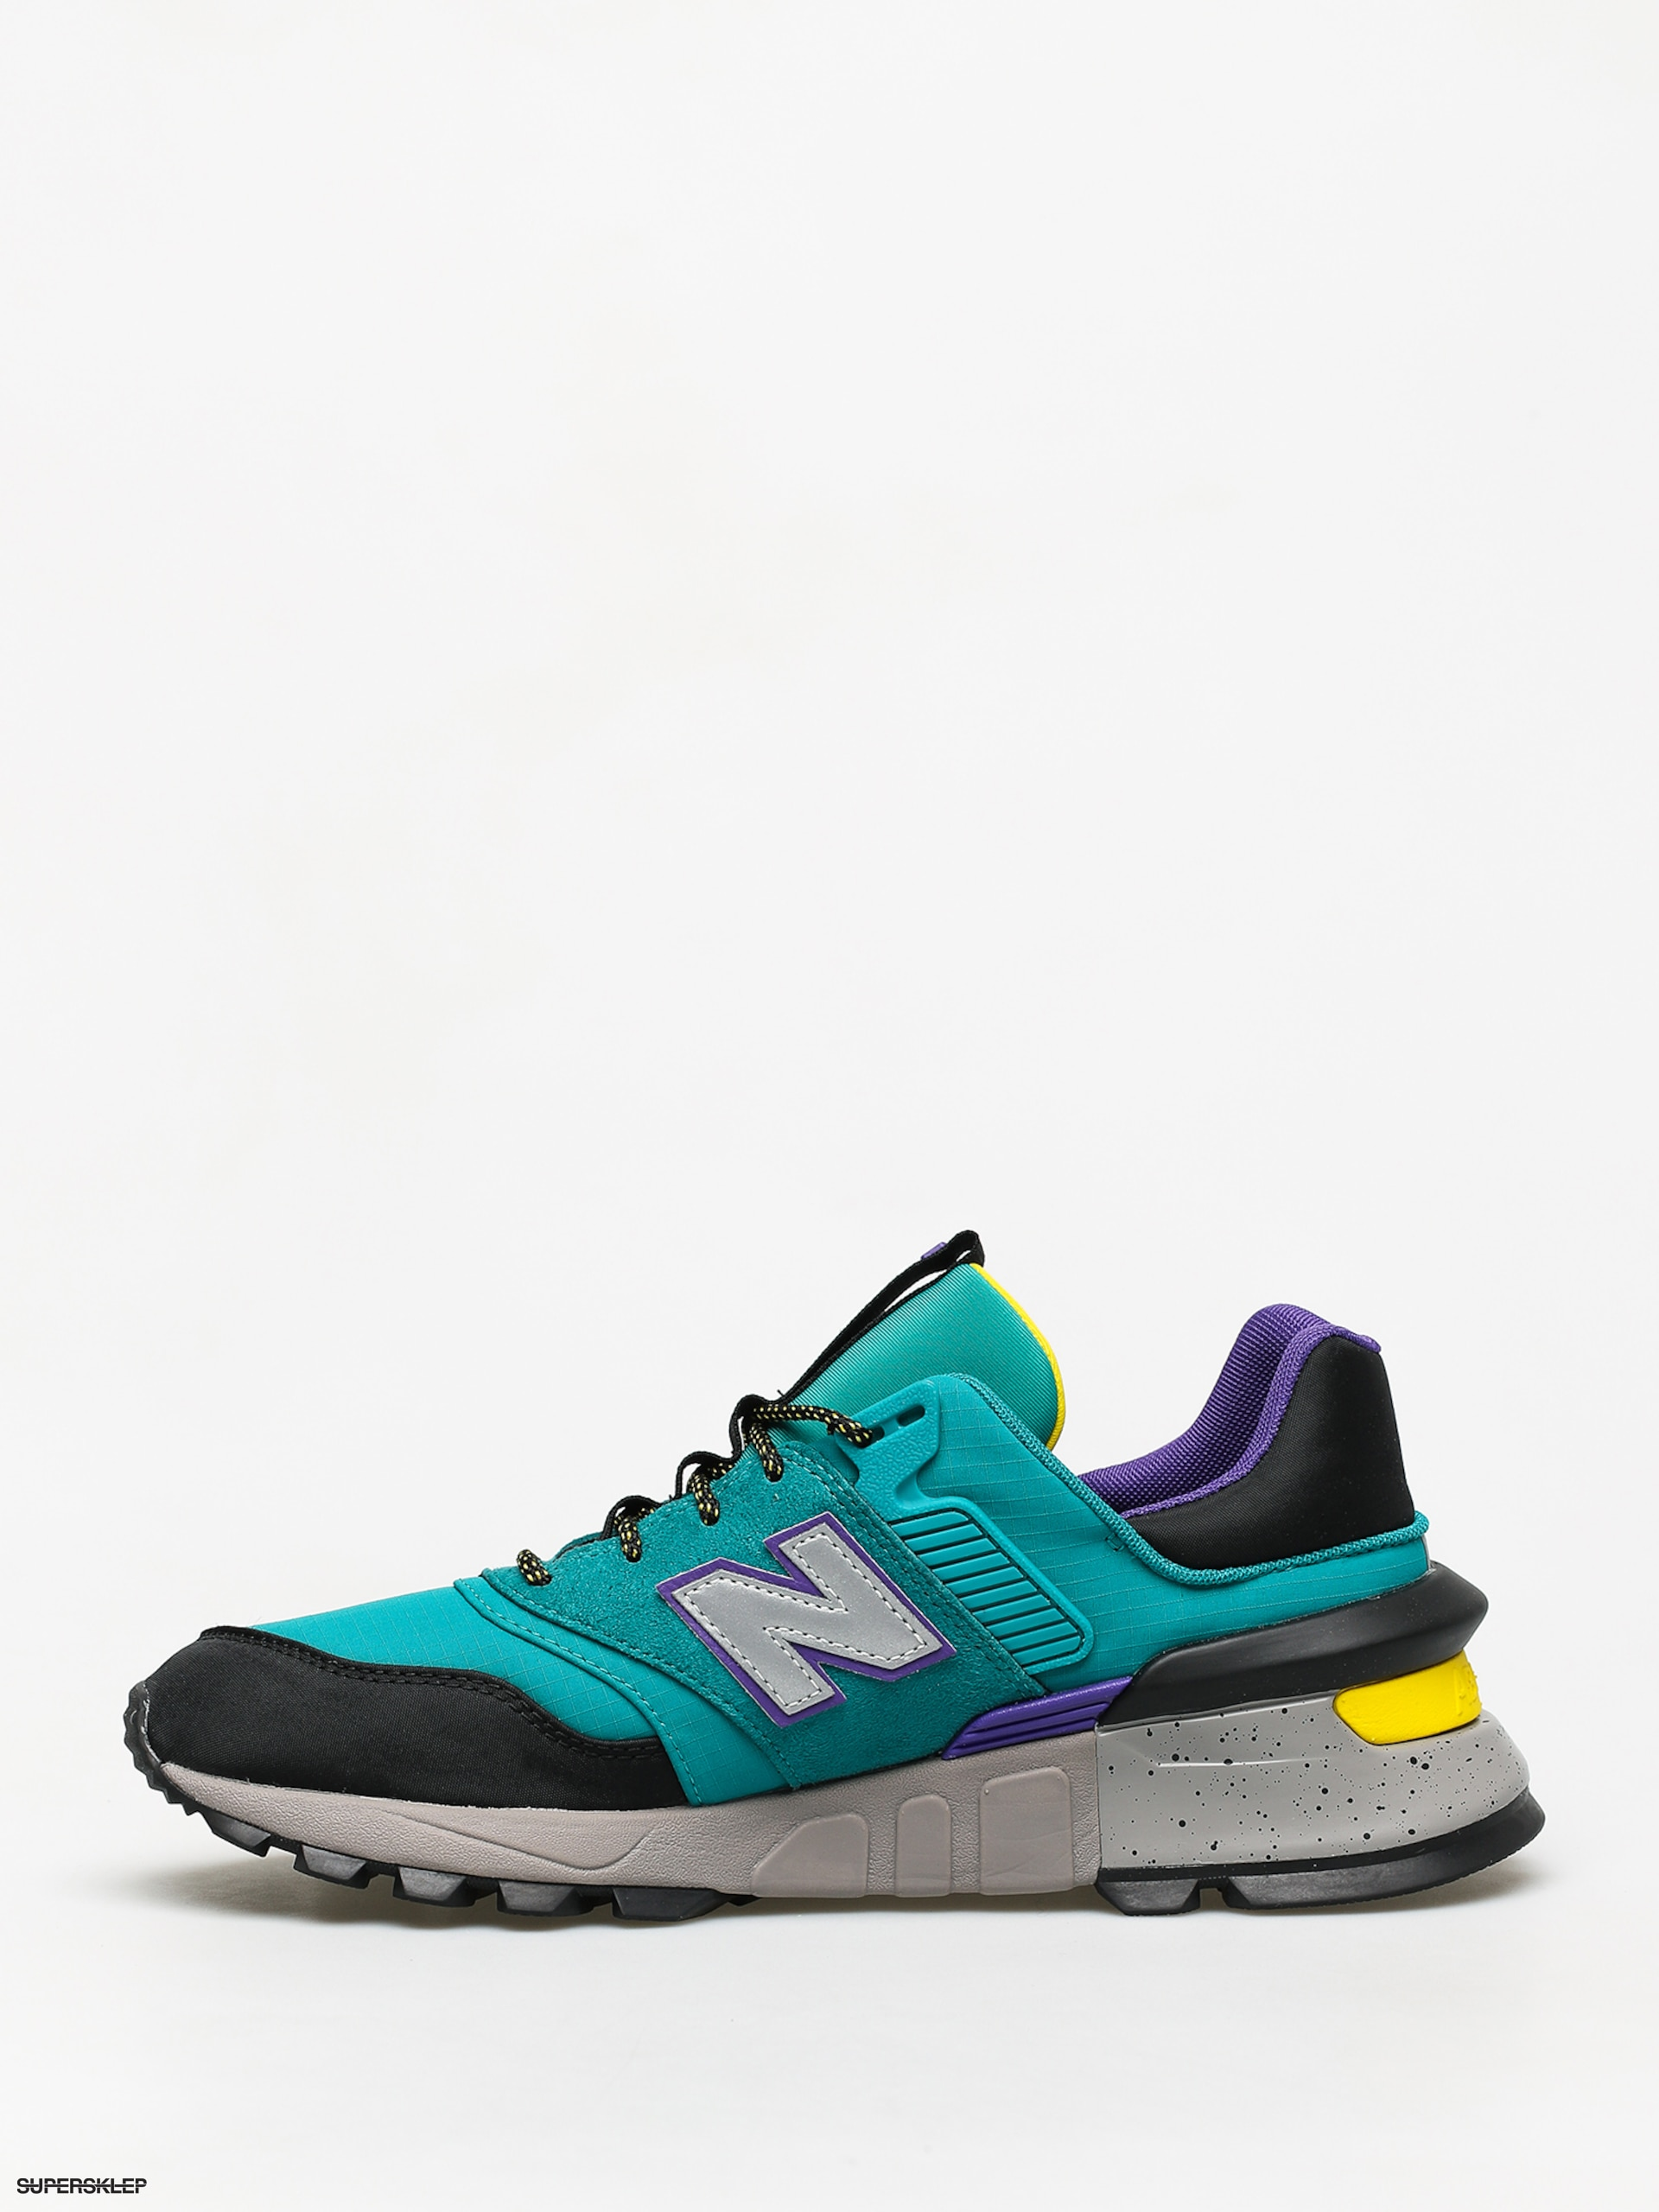 حصان تحفظا ثقب Buty New Balance Sneakers Natural Soap Directory Org